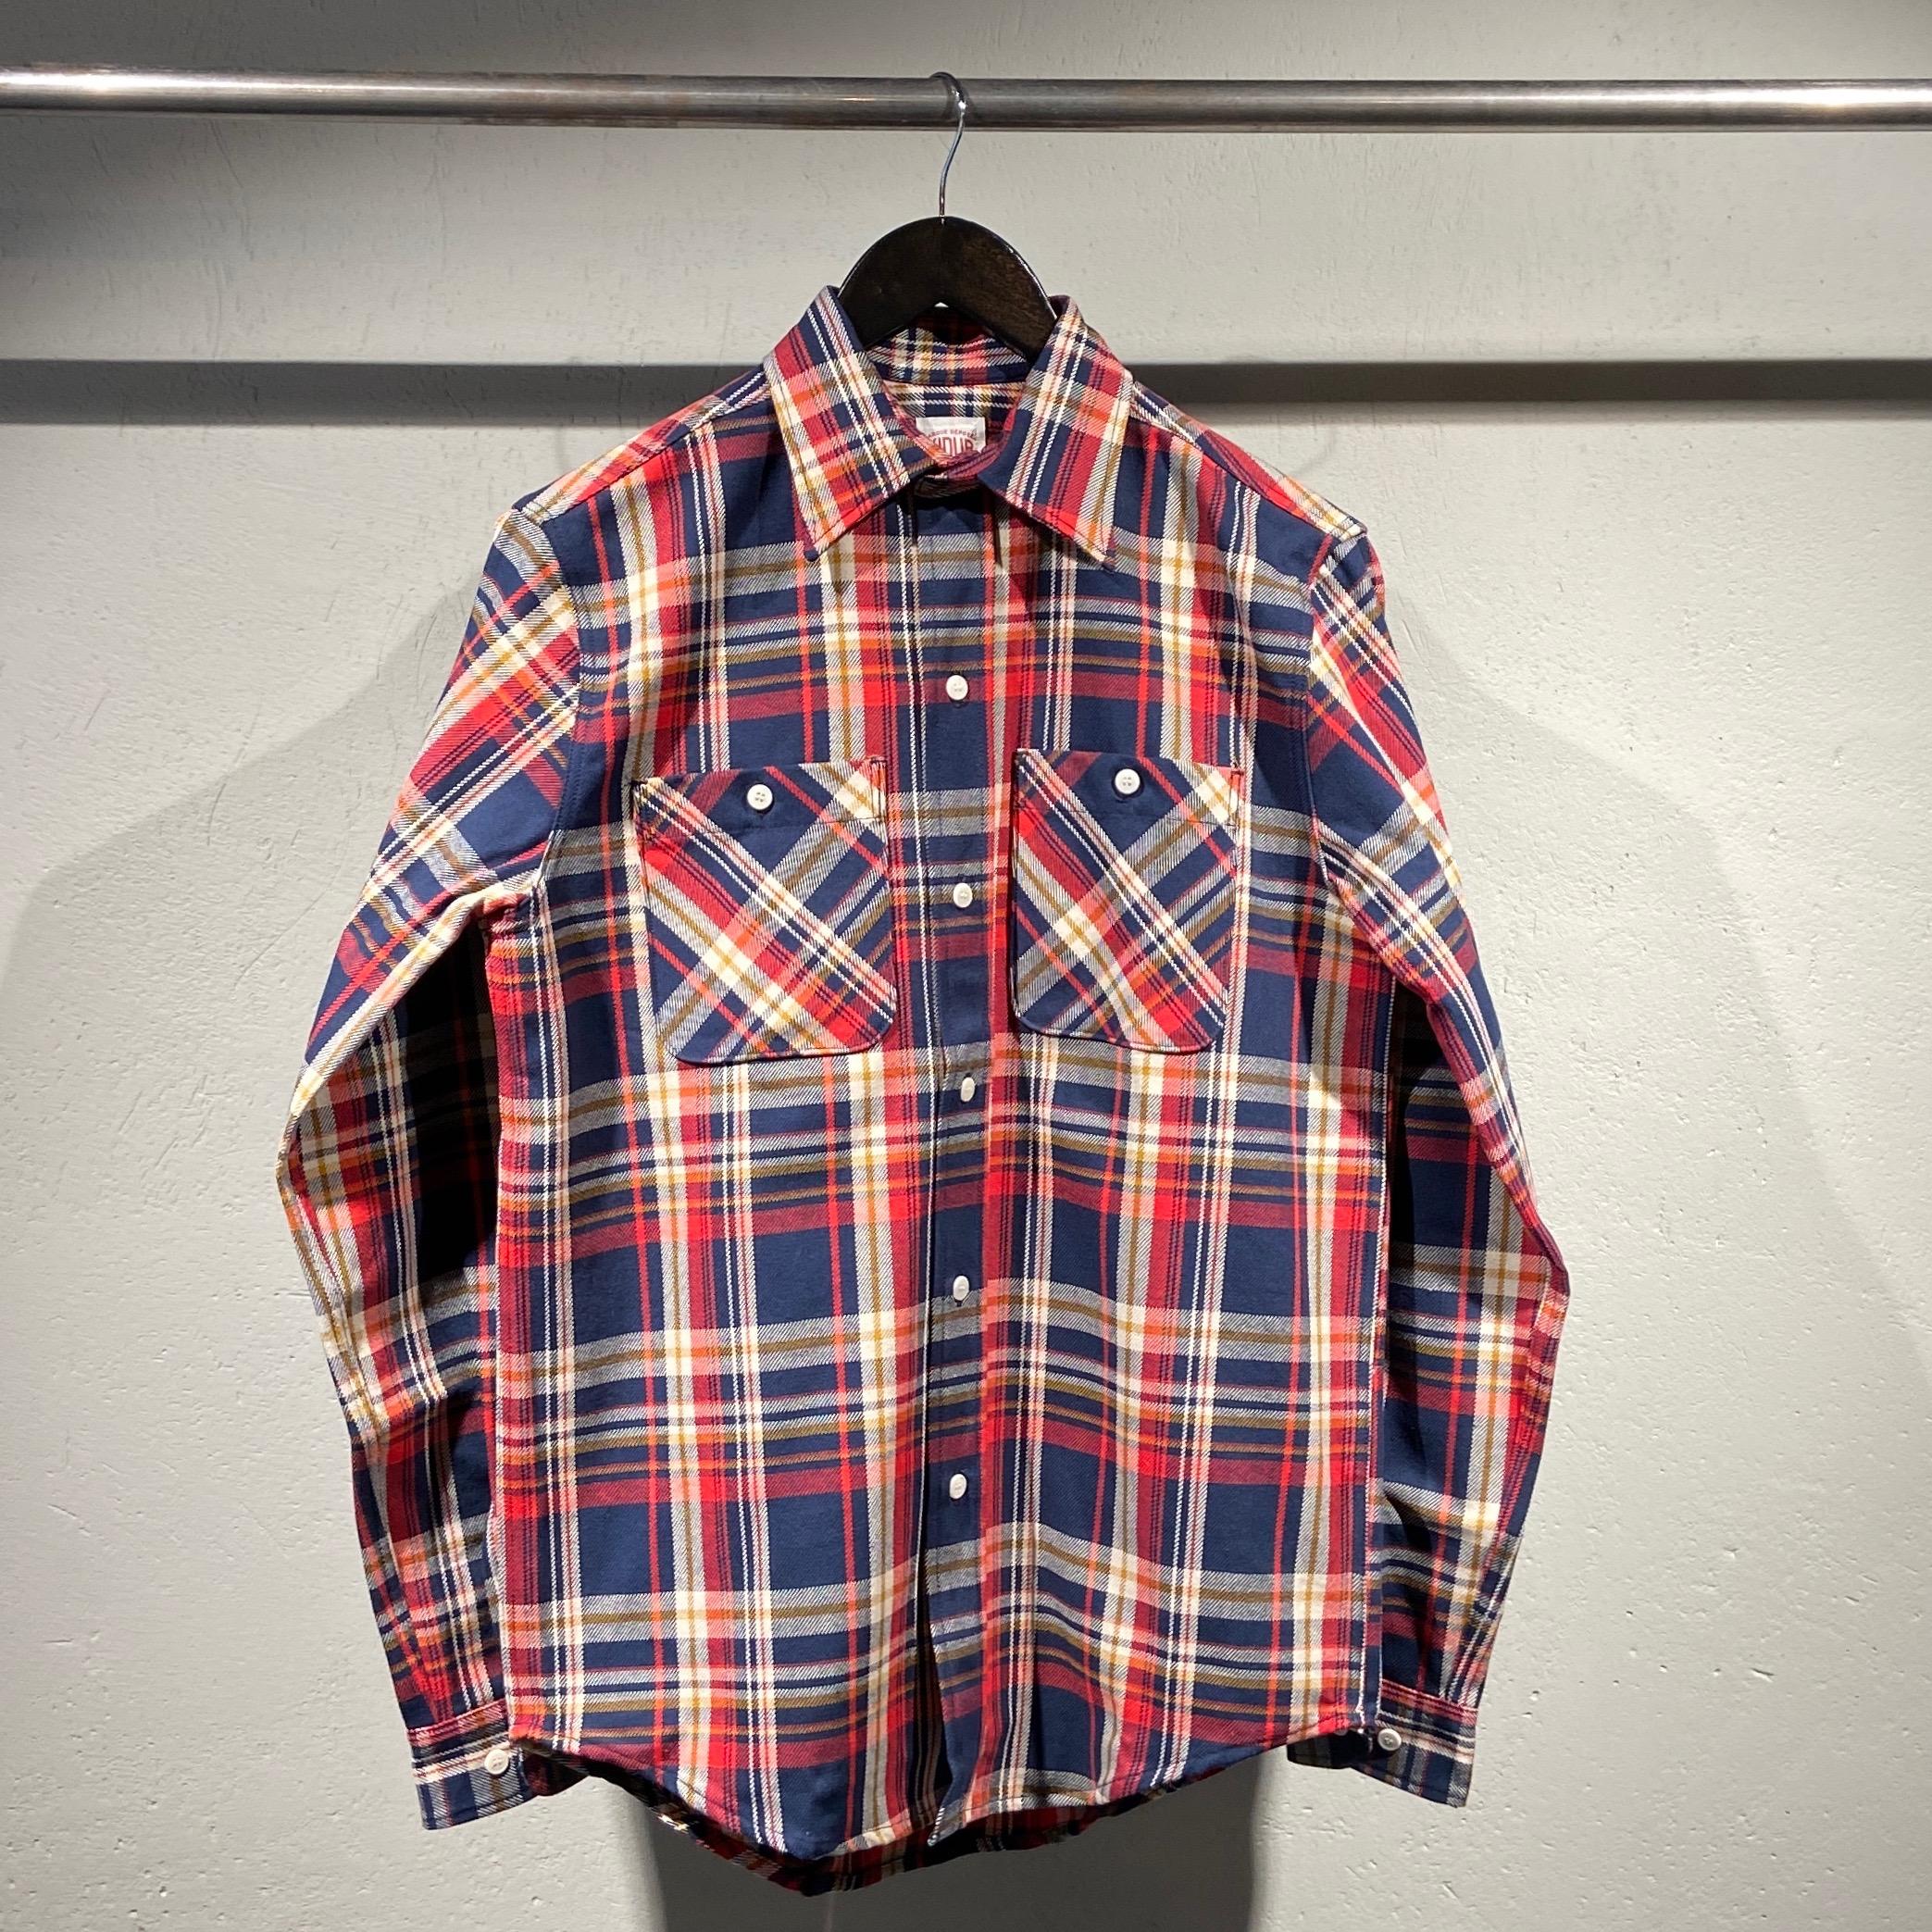 Kidur Tartan Work Shirt